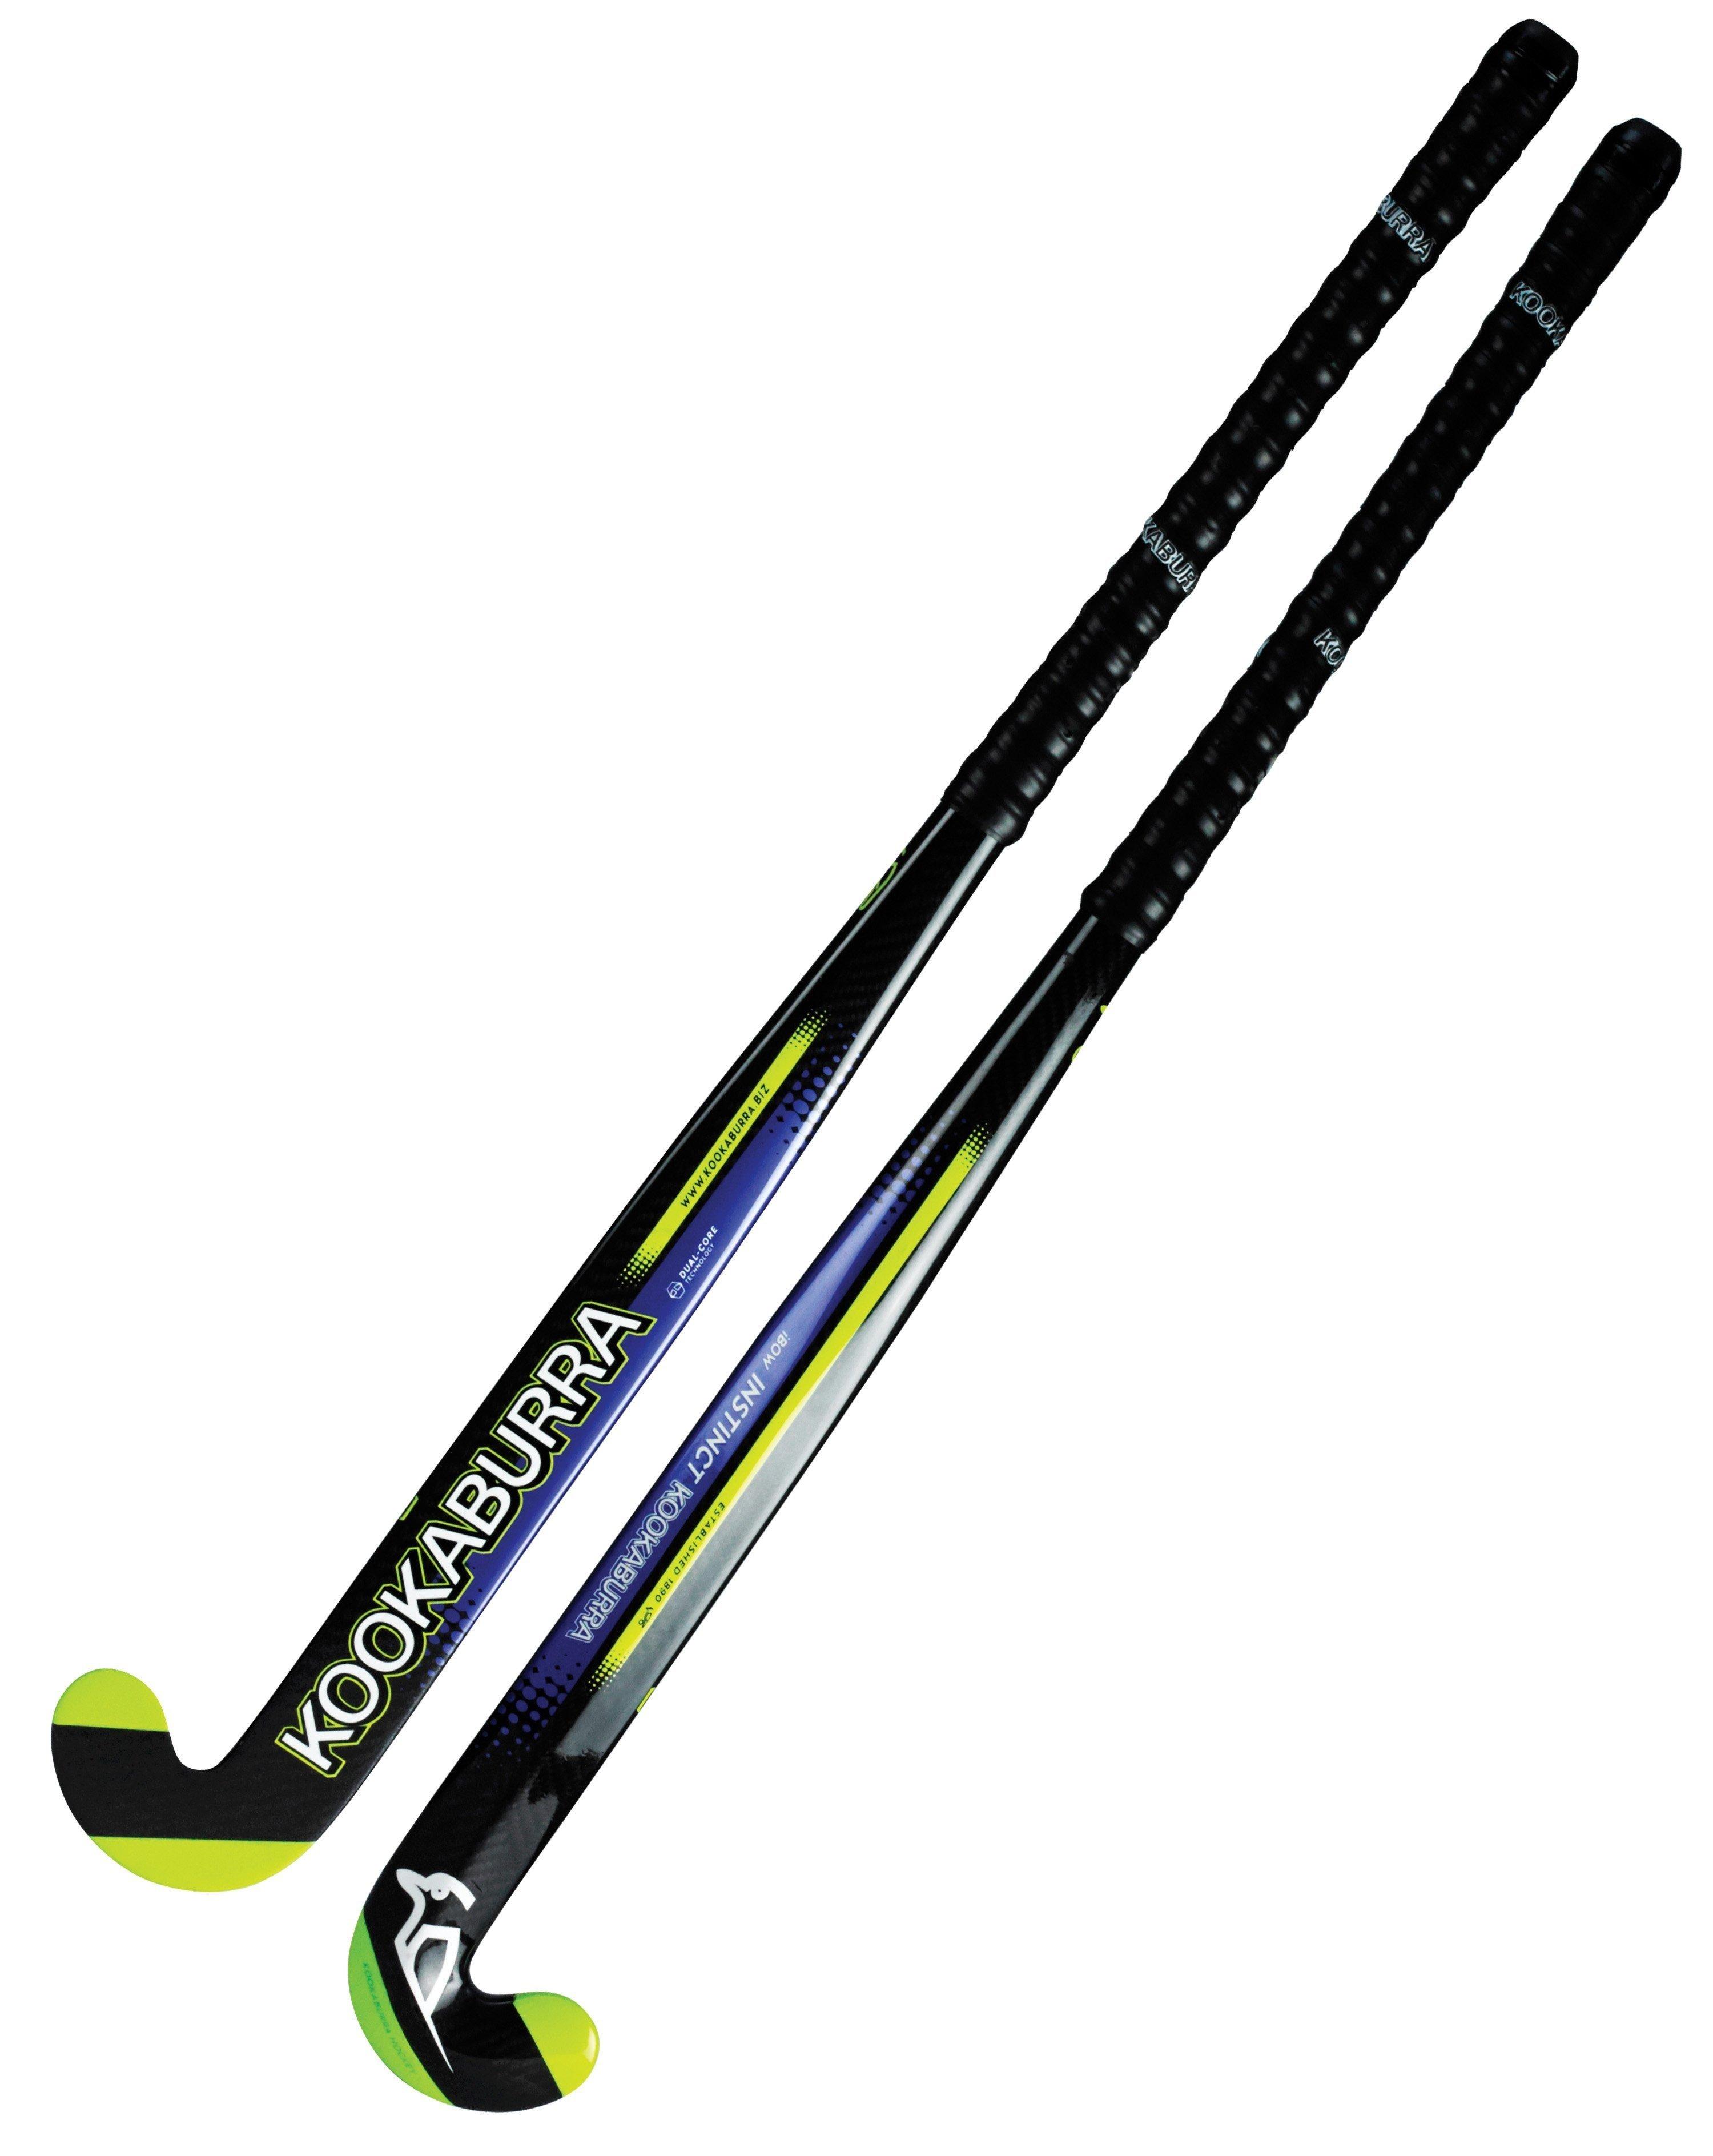 2016/17 Kookaburra Instinct Hockey Stick